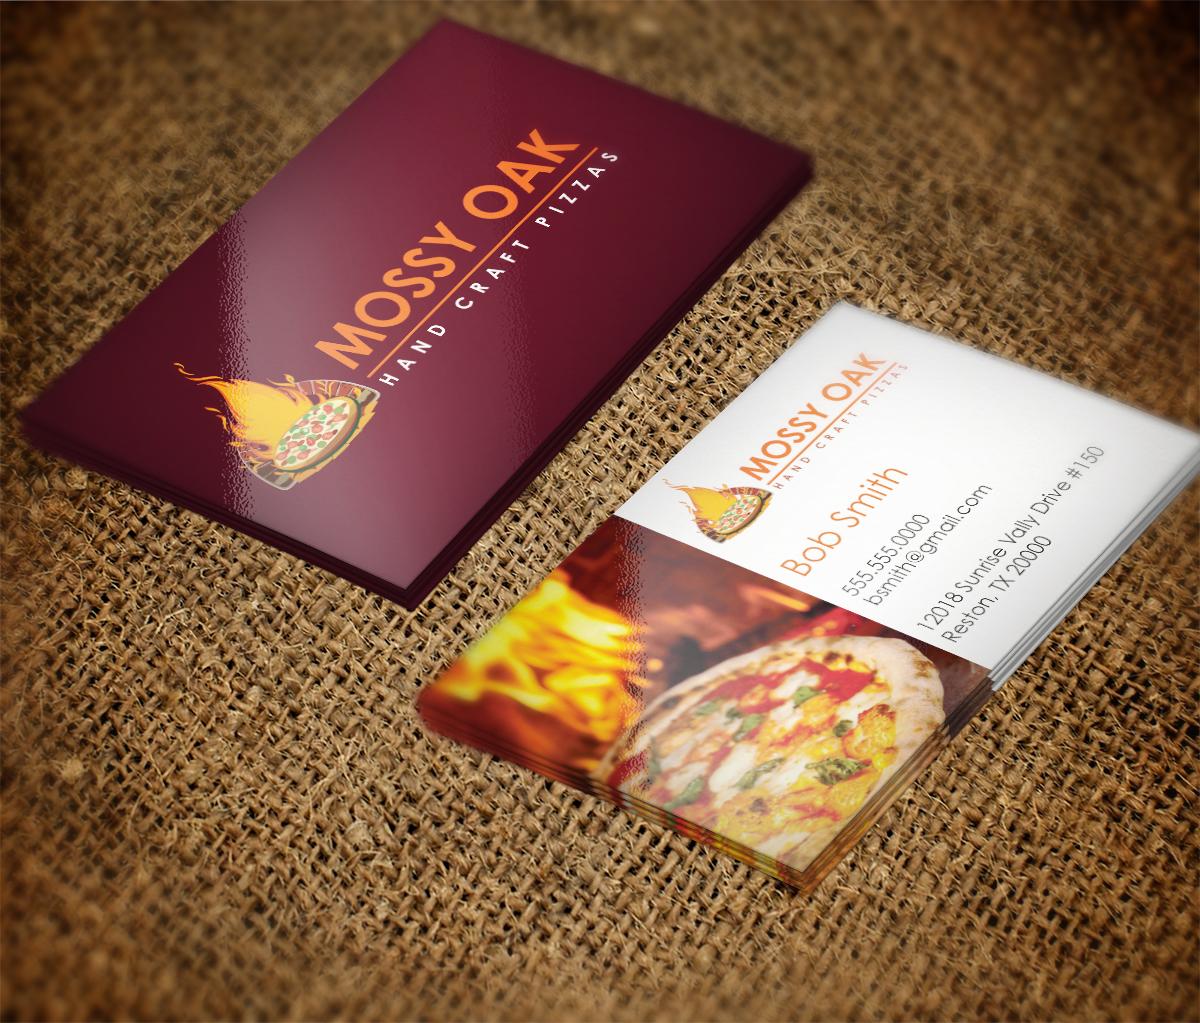 Business Card Design for curtis wright by CreativmindsJa | Design ...